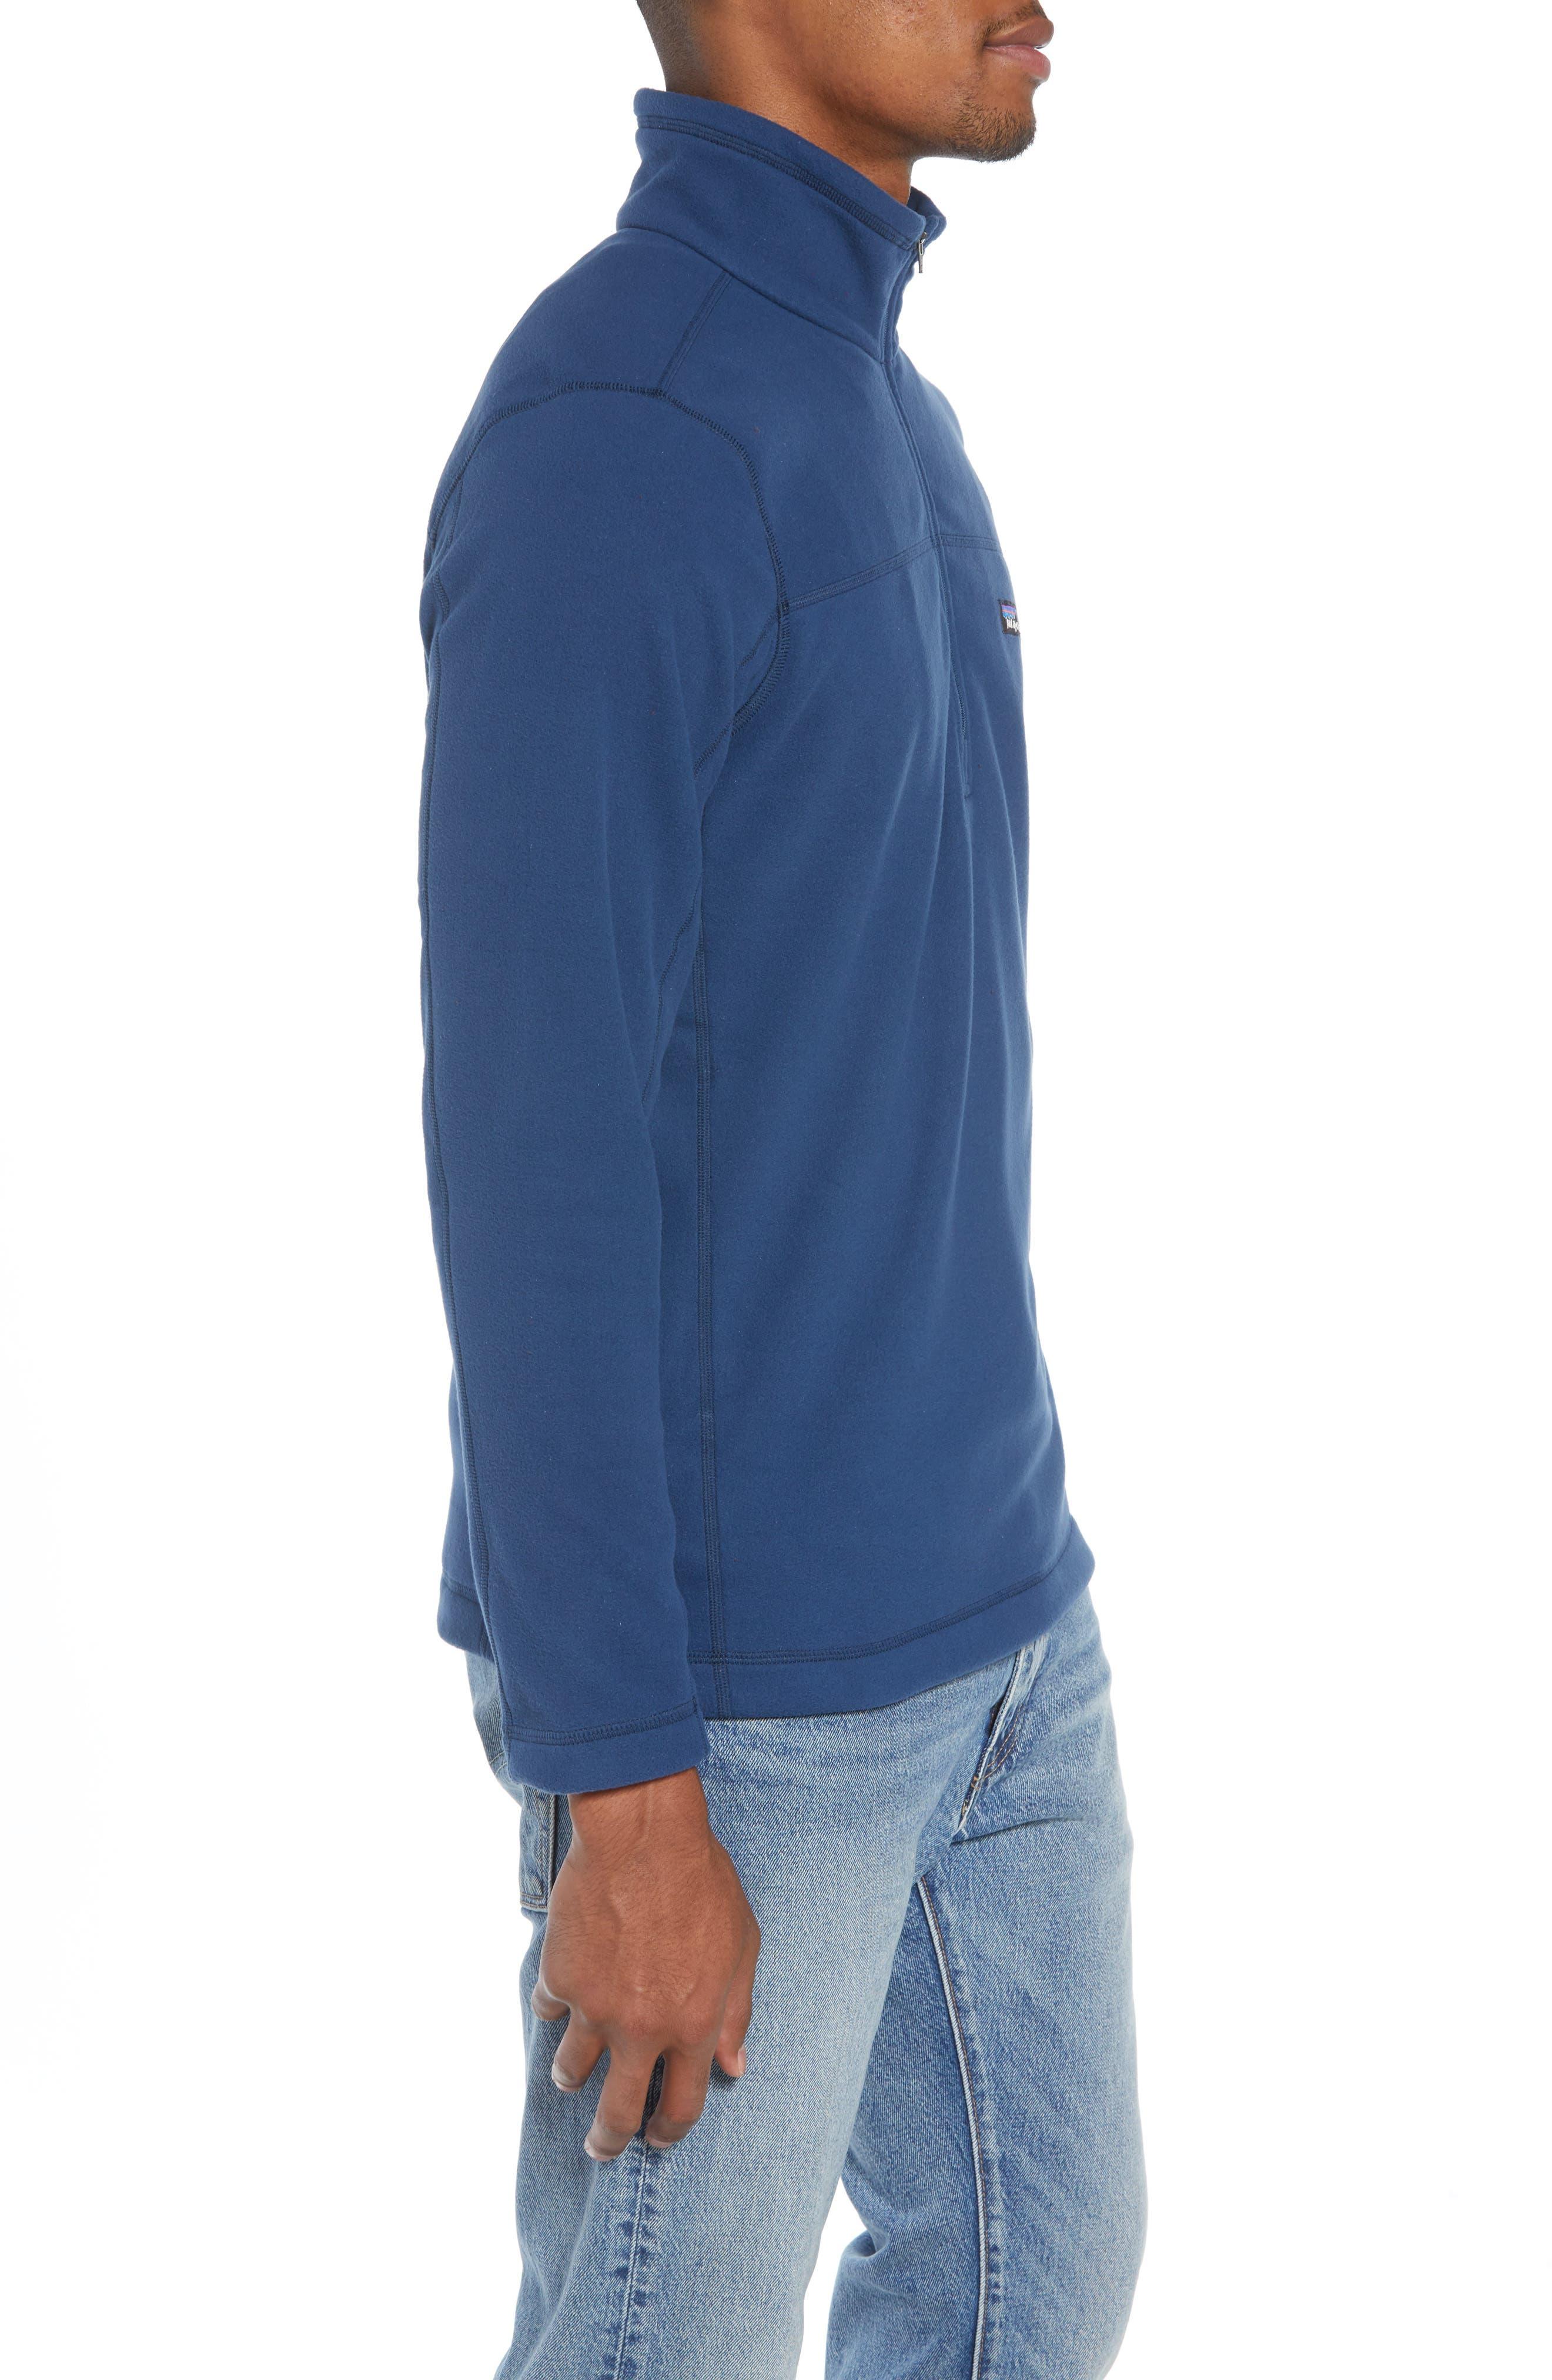 Fleece Pullover,                             Alternate thumbnail 3, color,                             STONE BLUE